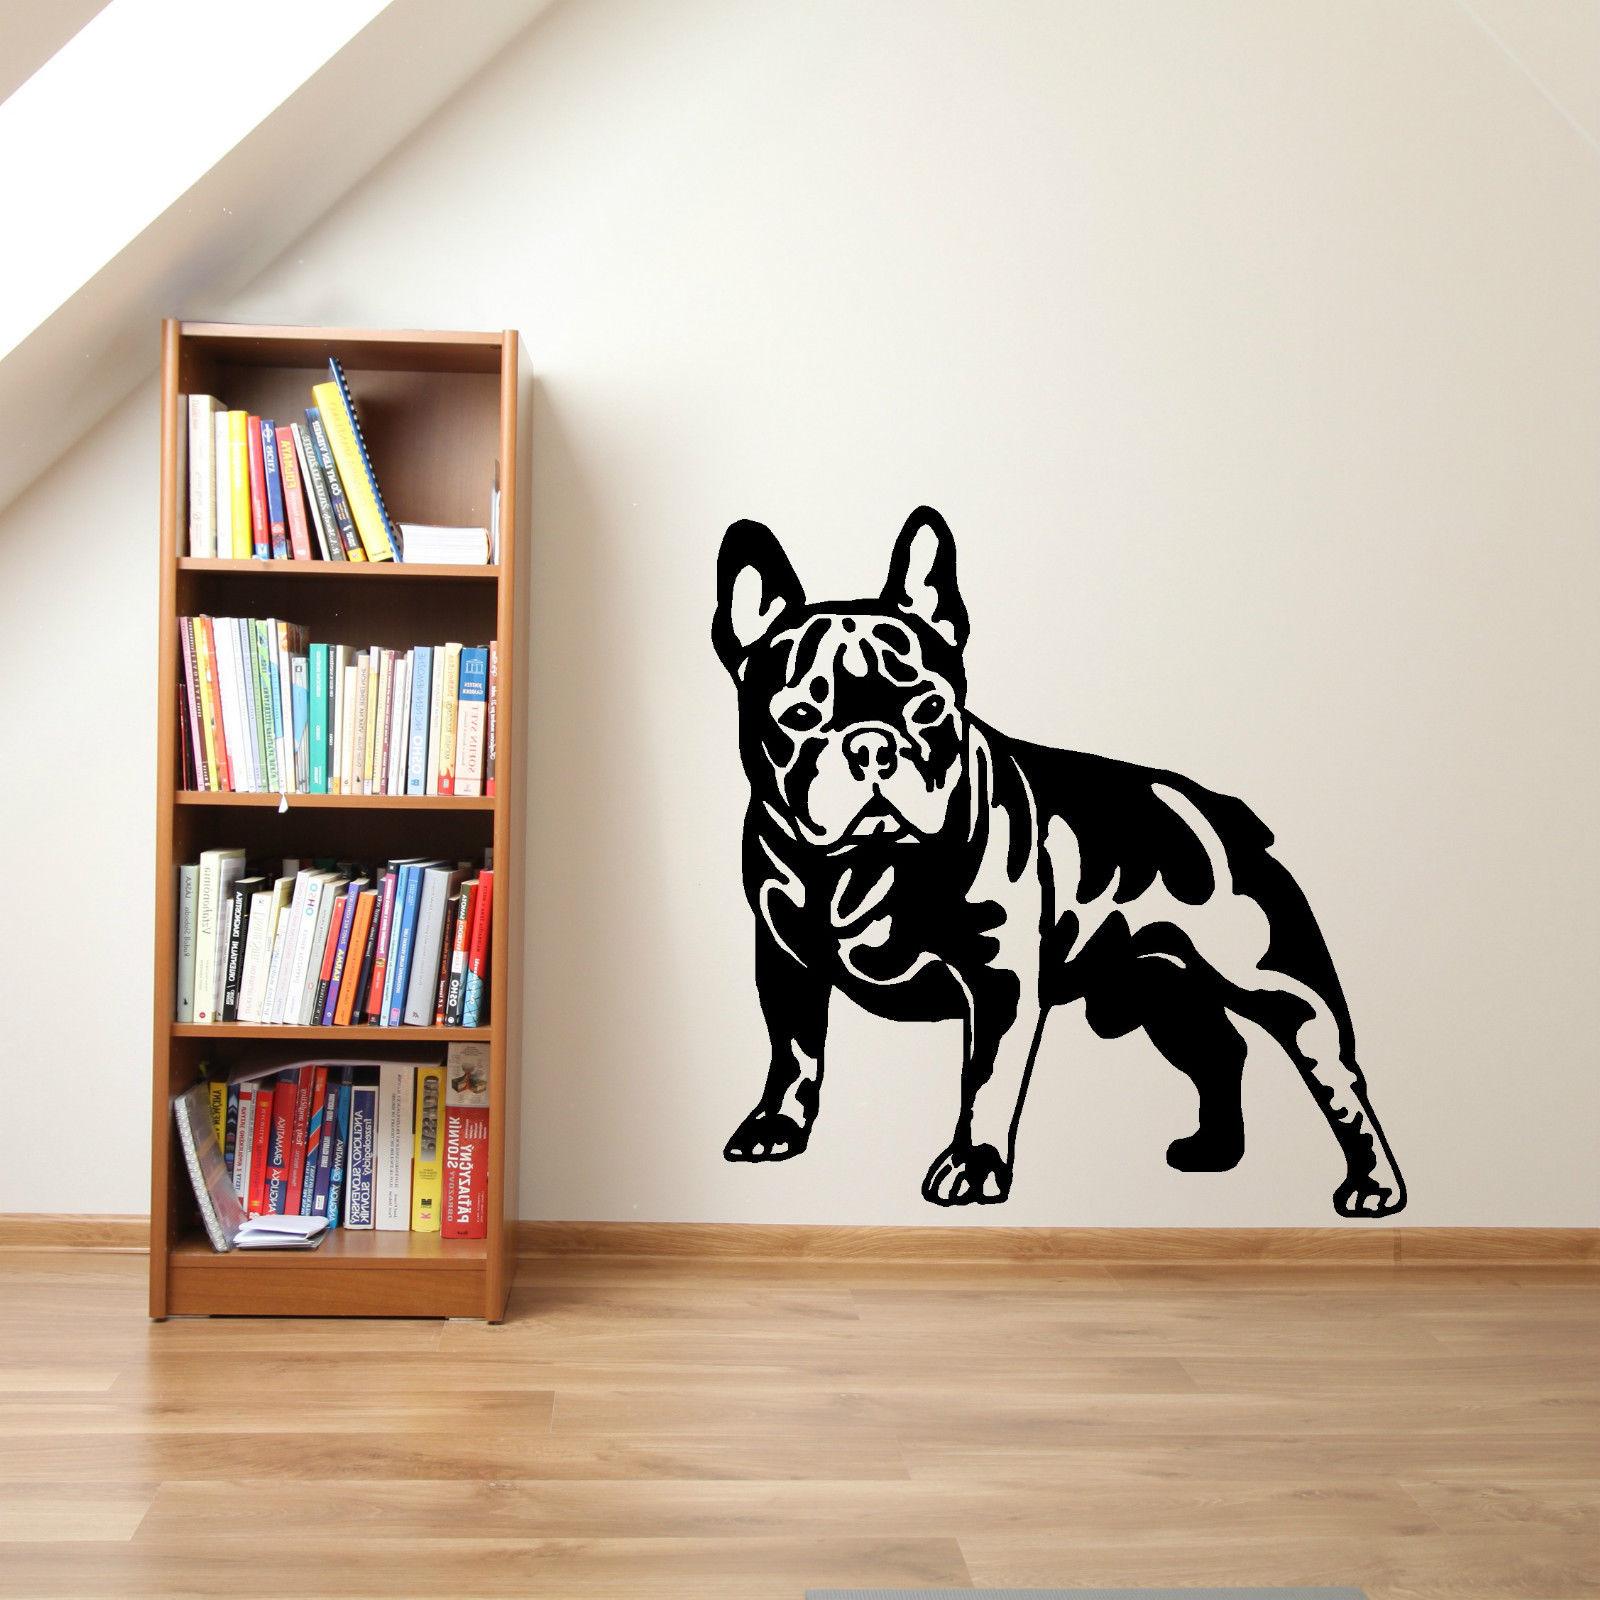 C186 FRENCH BULLDOG DOG vinyl wall art sticker home decor Removable wall decal